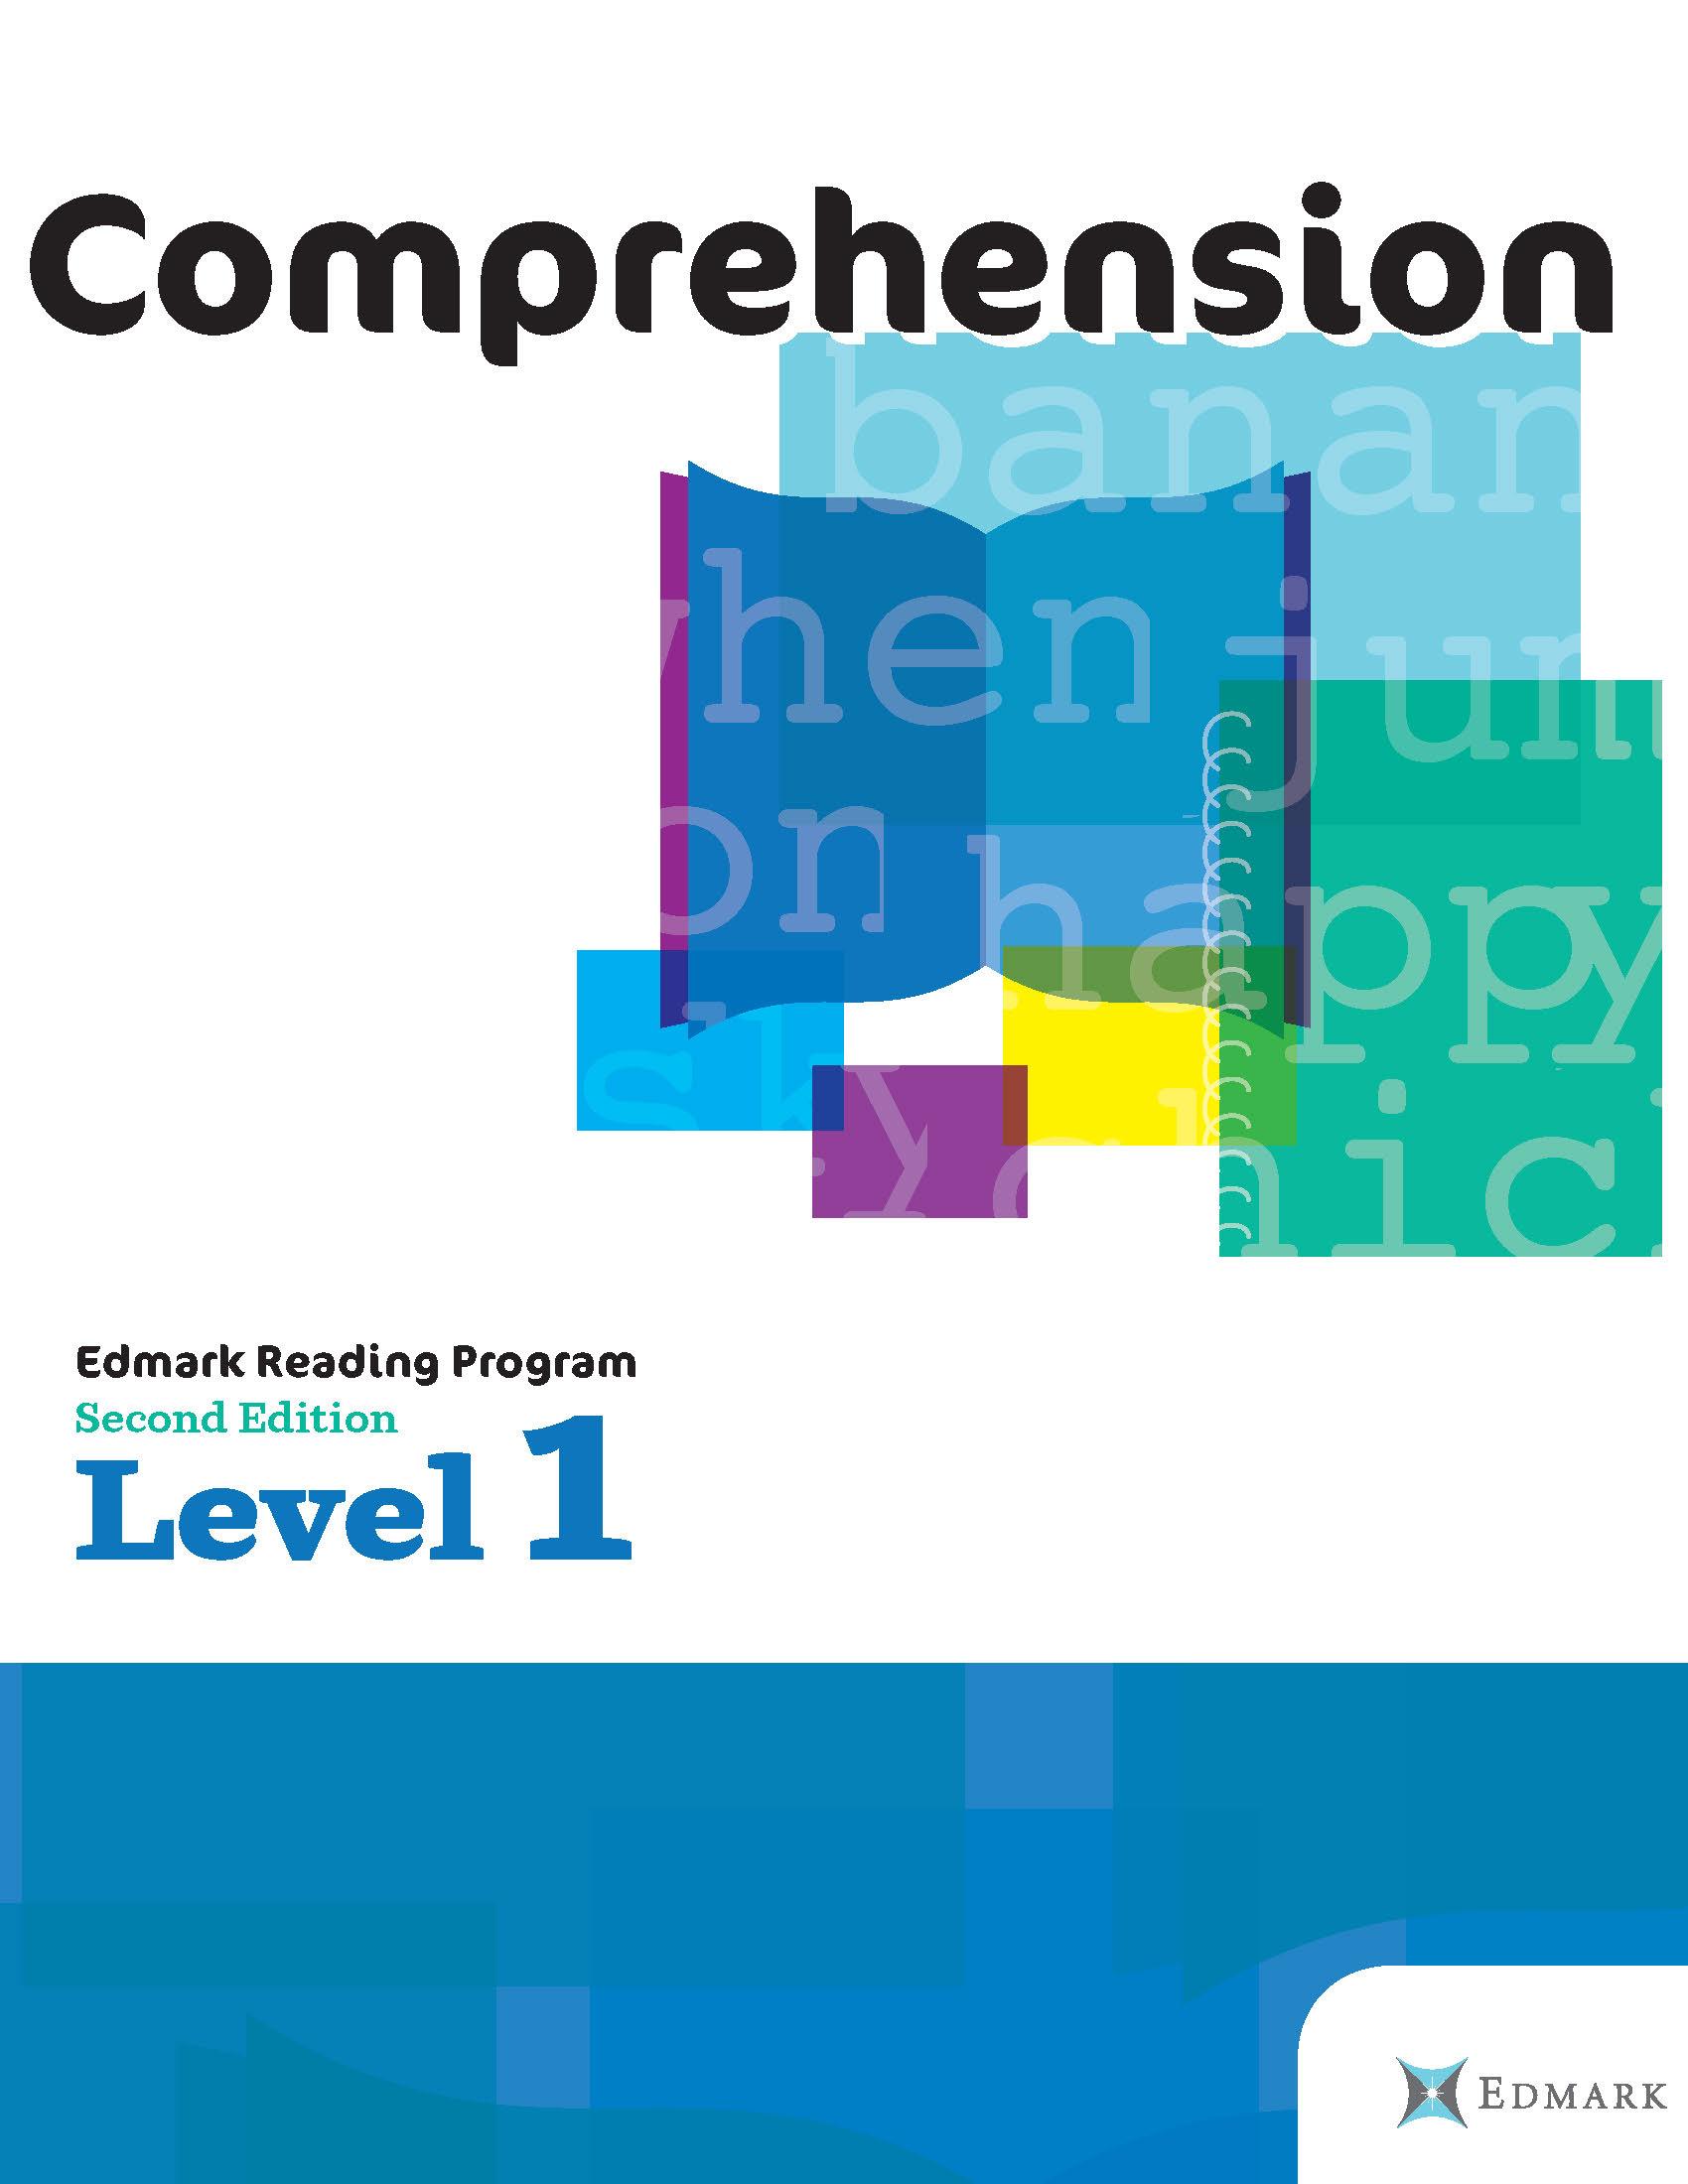 Edmark Reading Program Level 1 2e Comprehension 14394 image